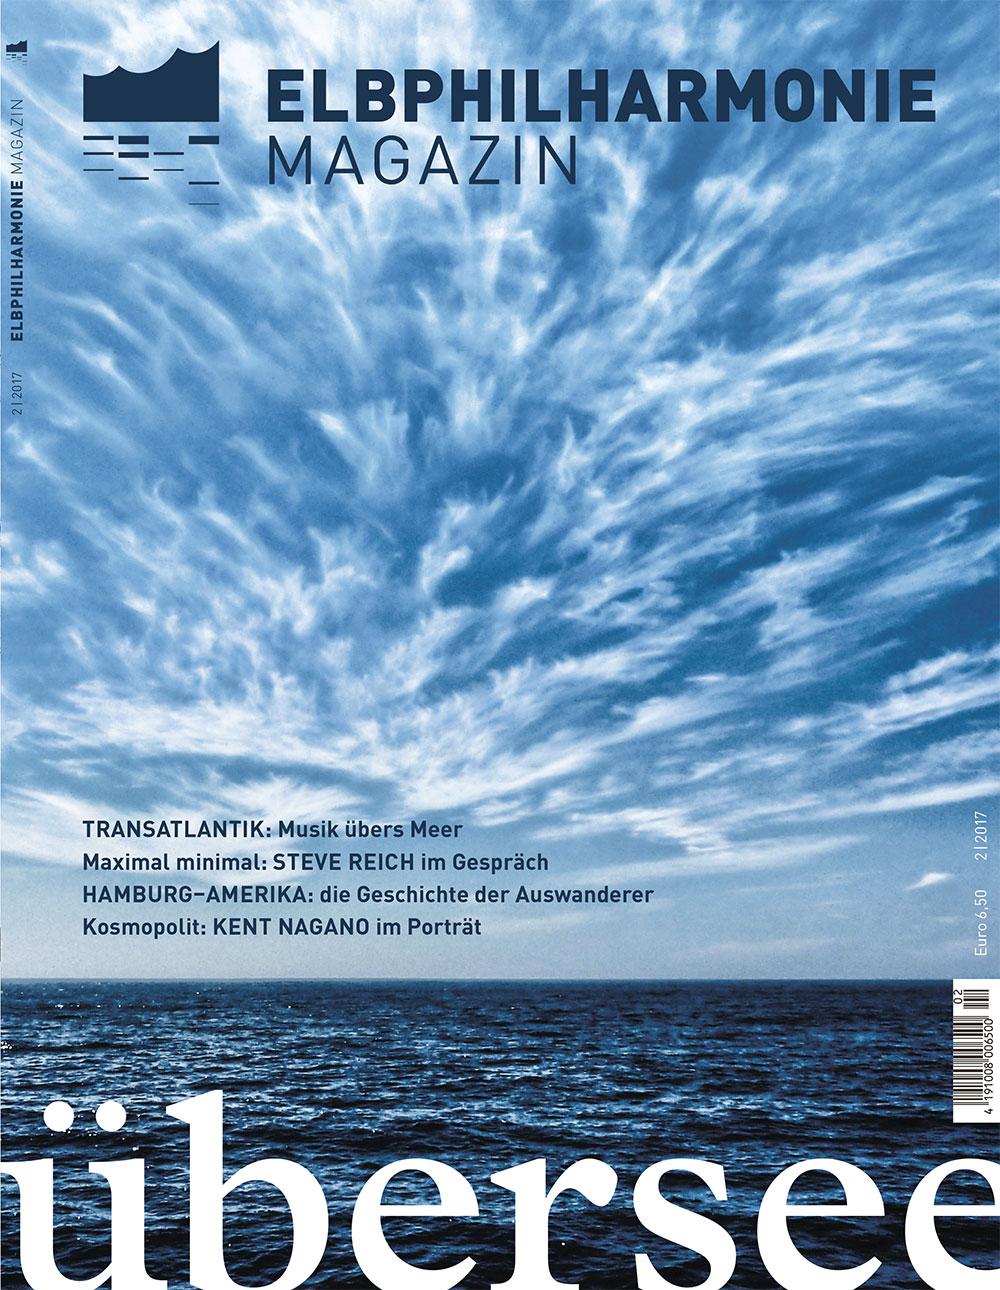 Elbphilharmonie Magazine »übersee« / Second Issue